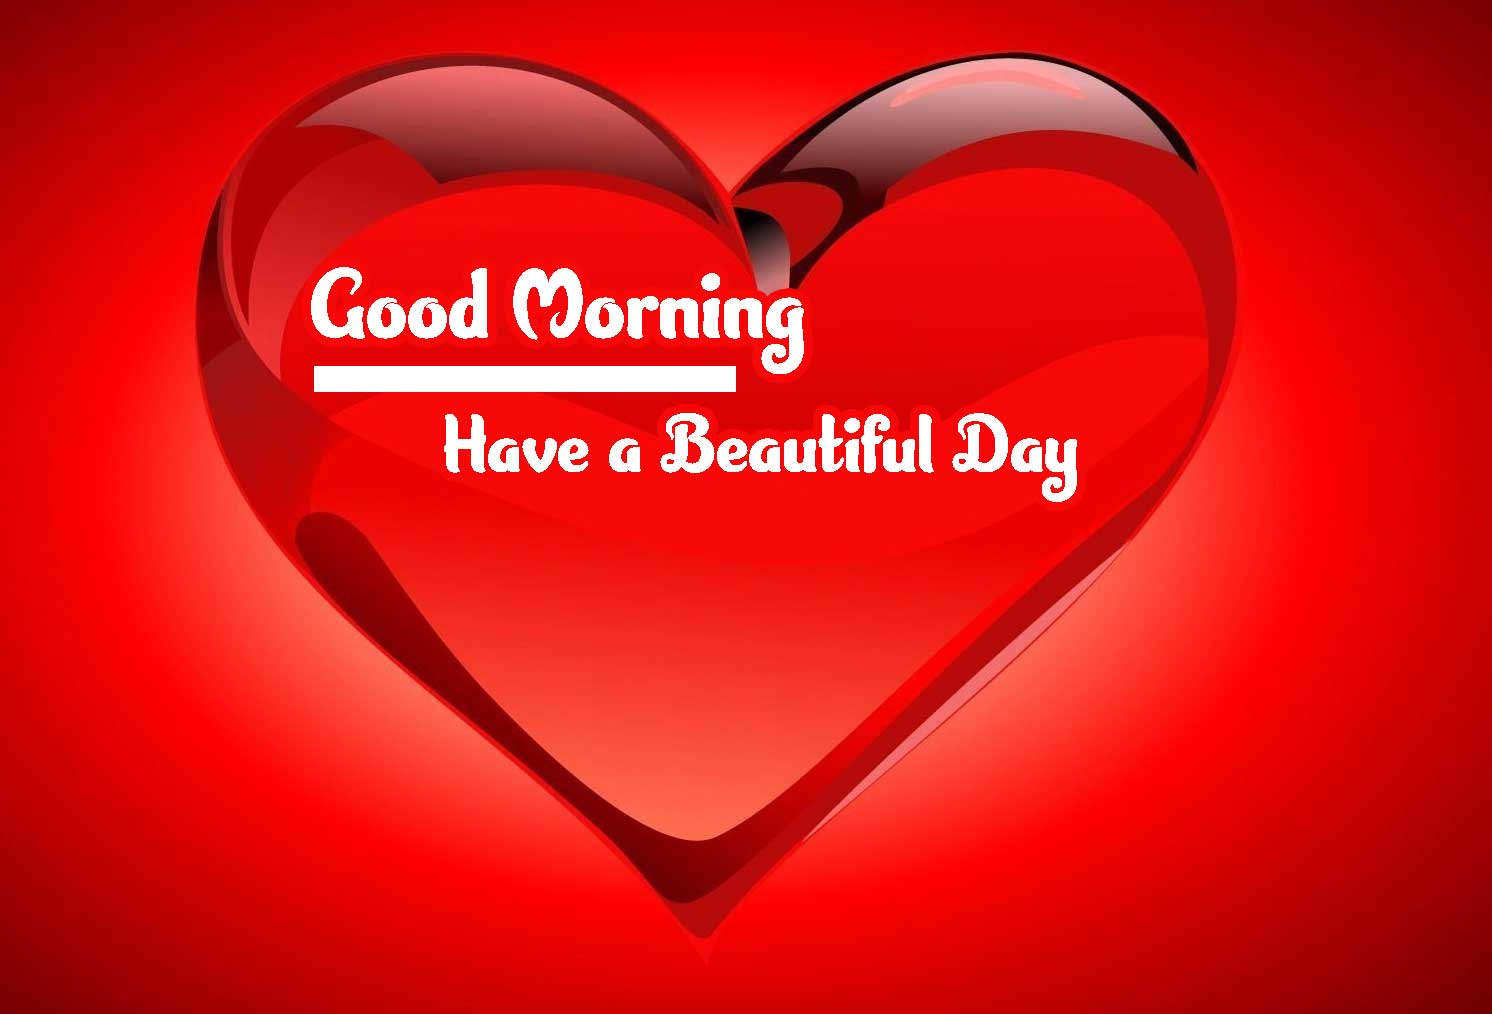 Amazing 1080 p Good Morning 4k ImagesPics Wallpaper Download